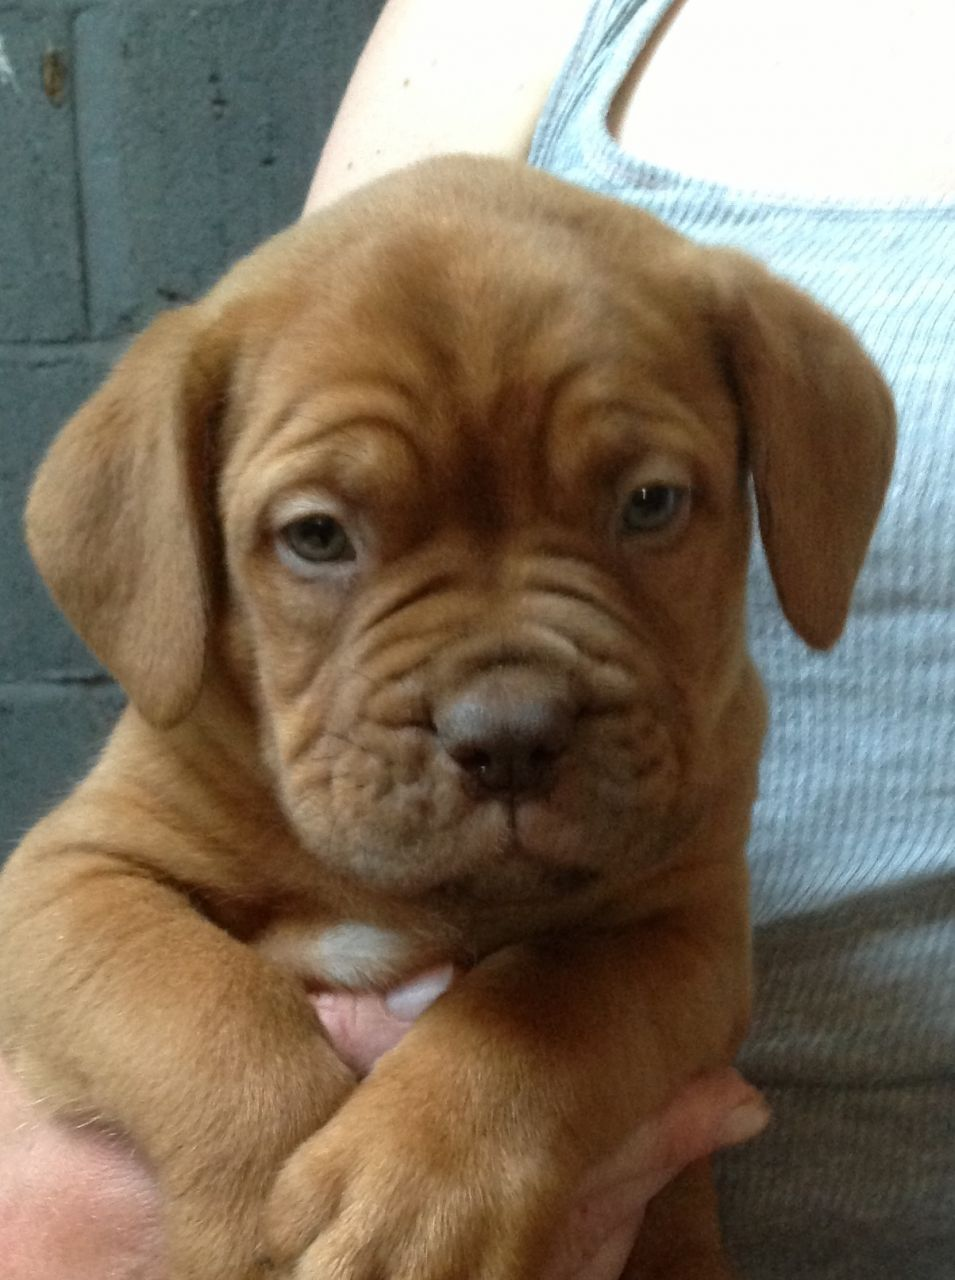 Dogue de Bordeaux Puppies: Dogue Dogue De Bordeaux Puppies Kings Lynn Breed